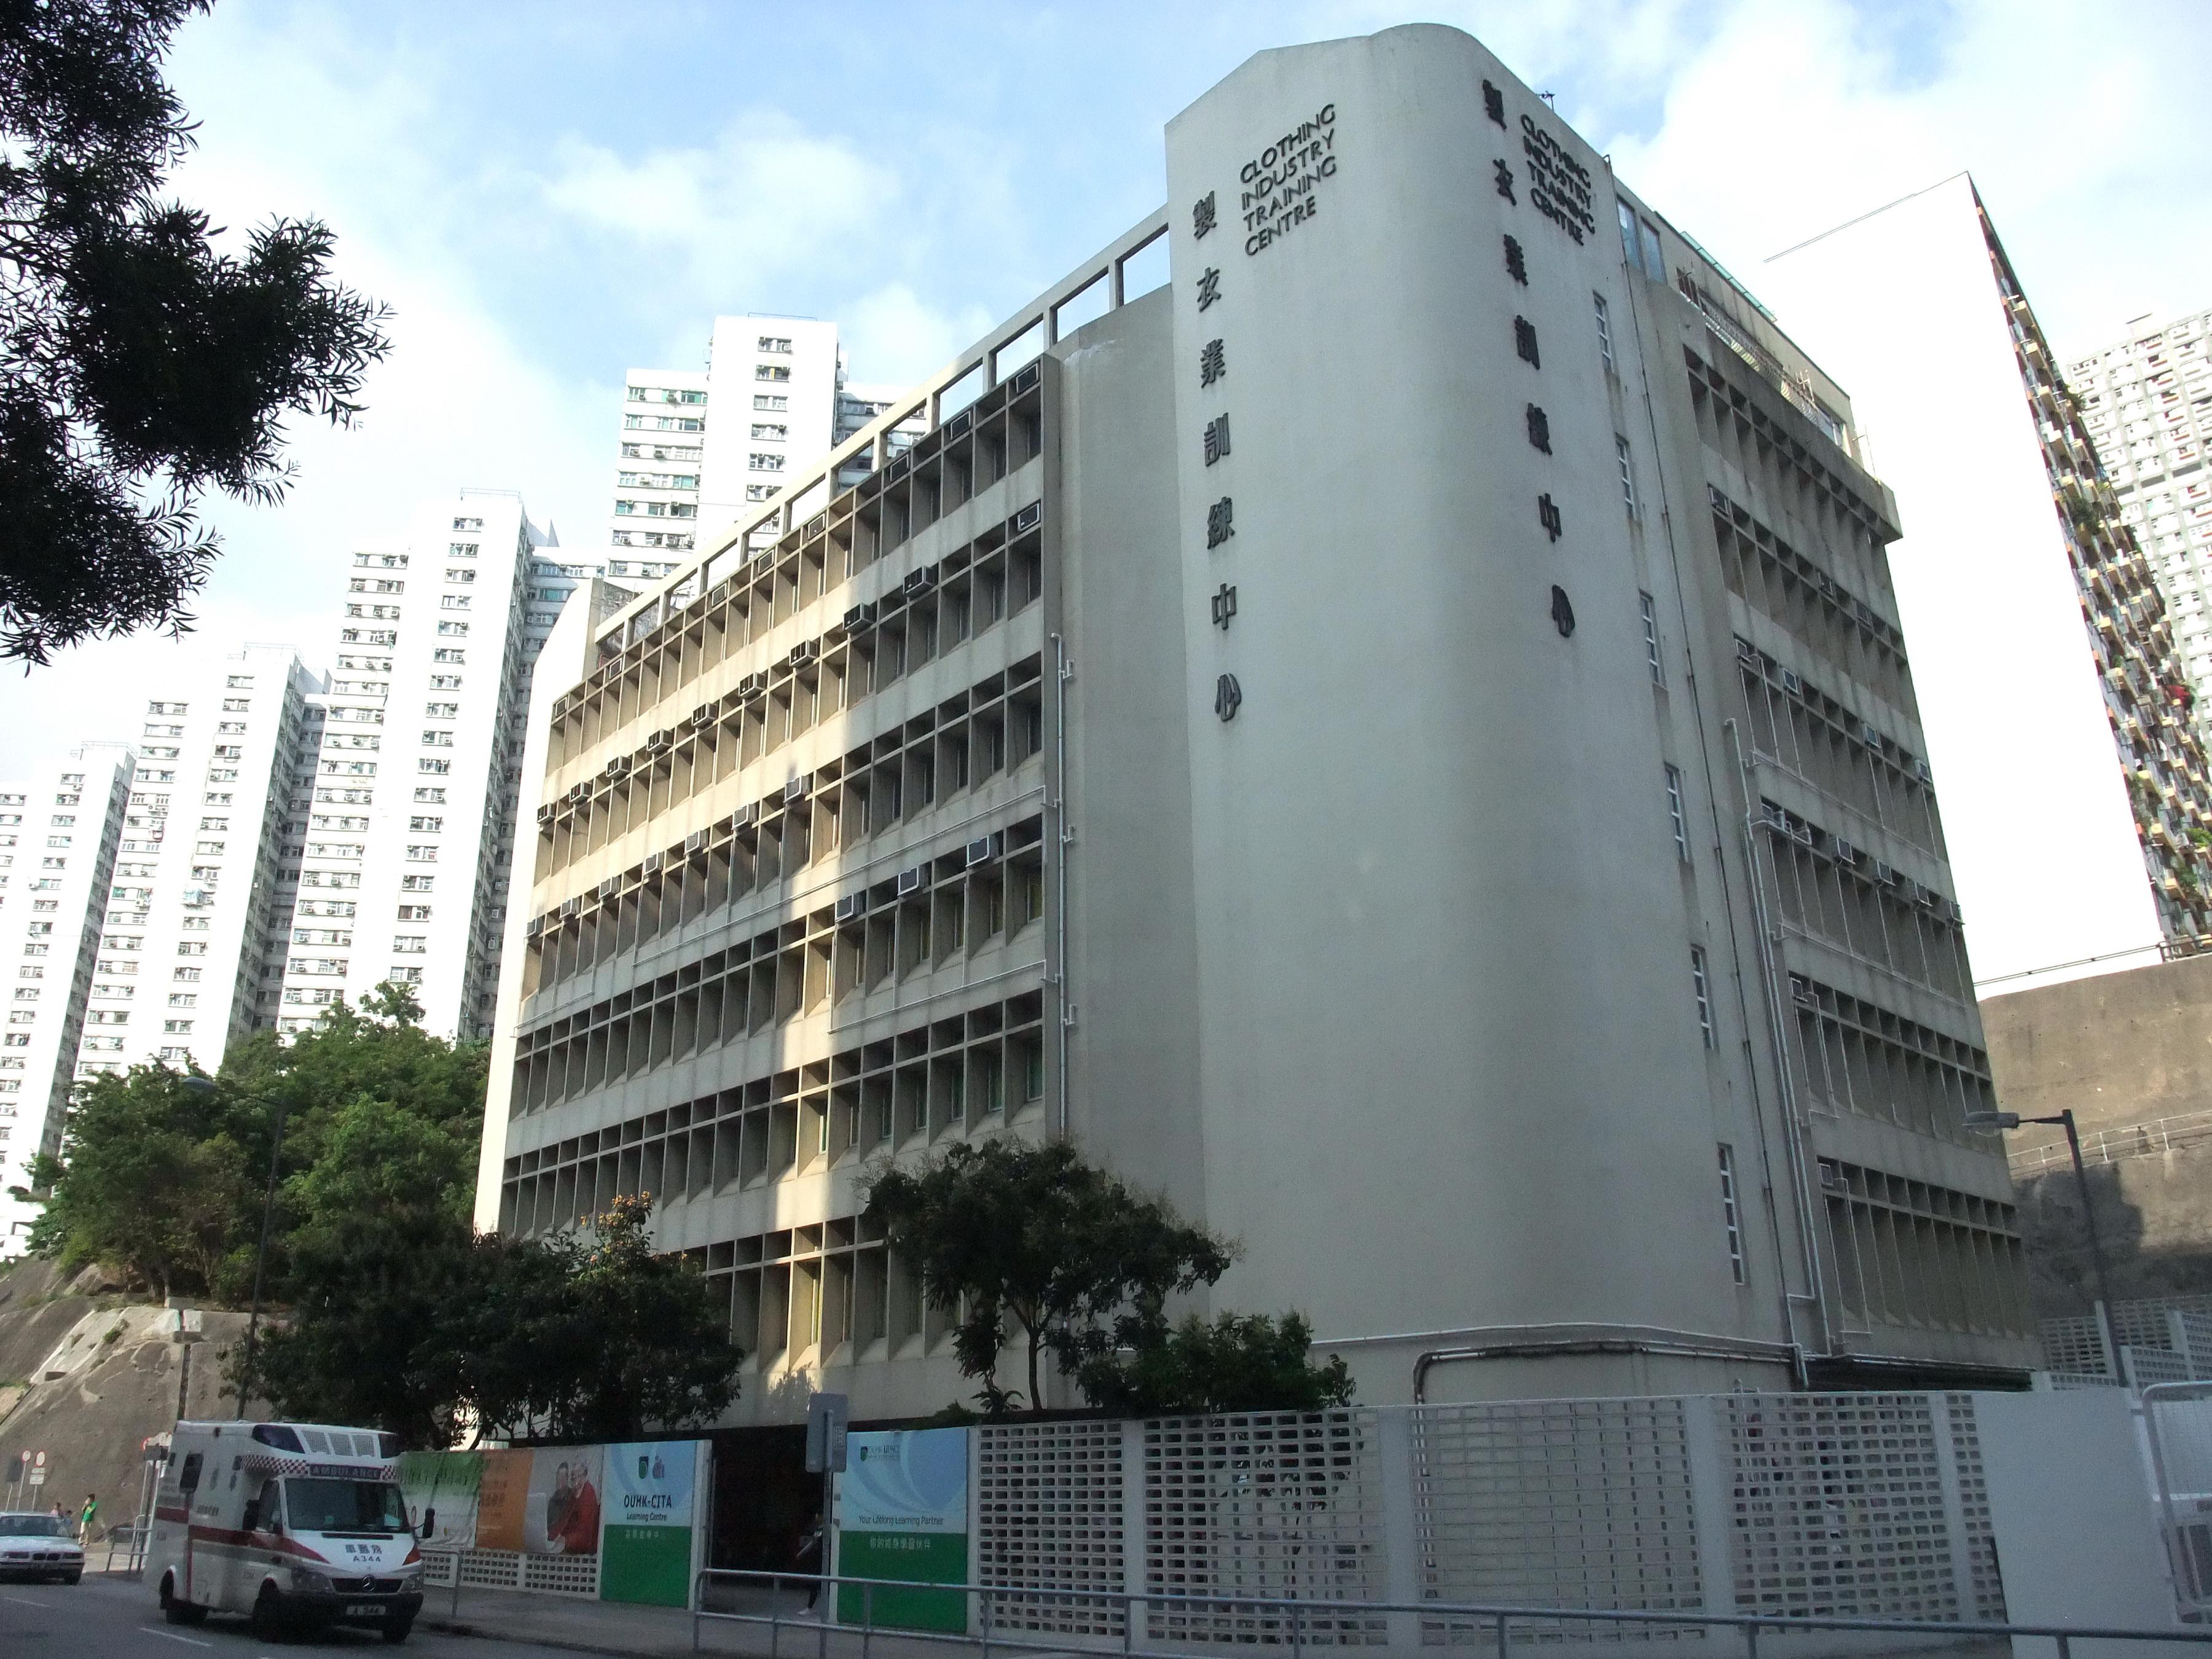 Description open university of hong kong - cita learning centre